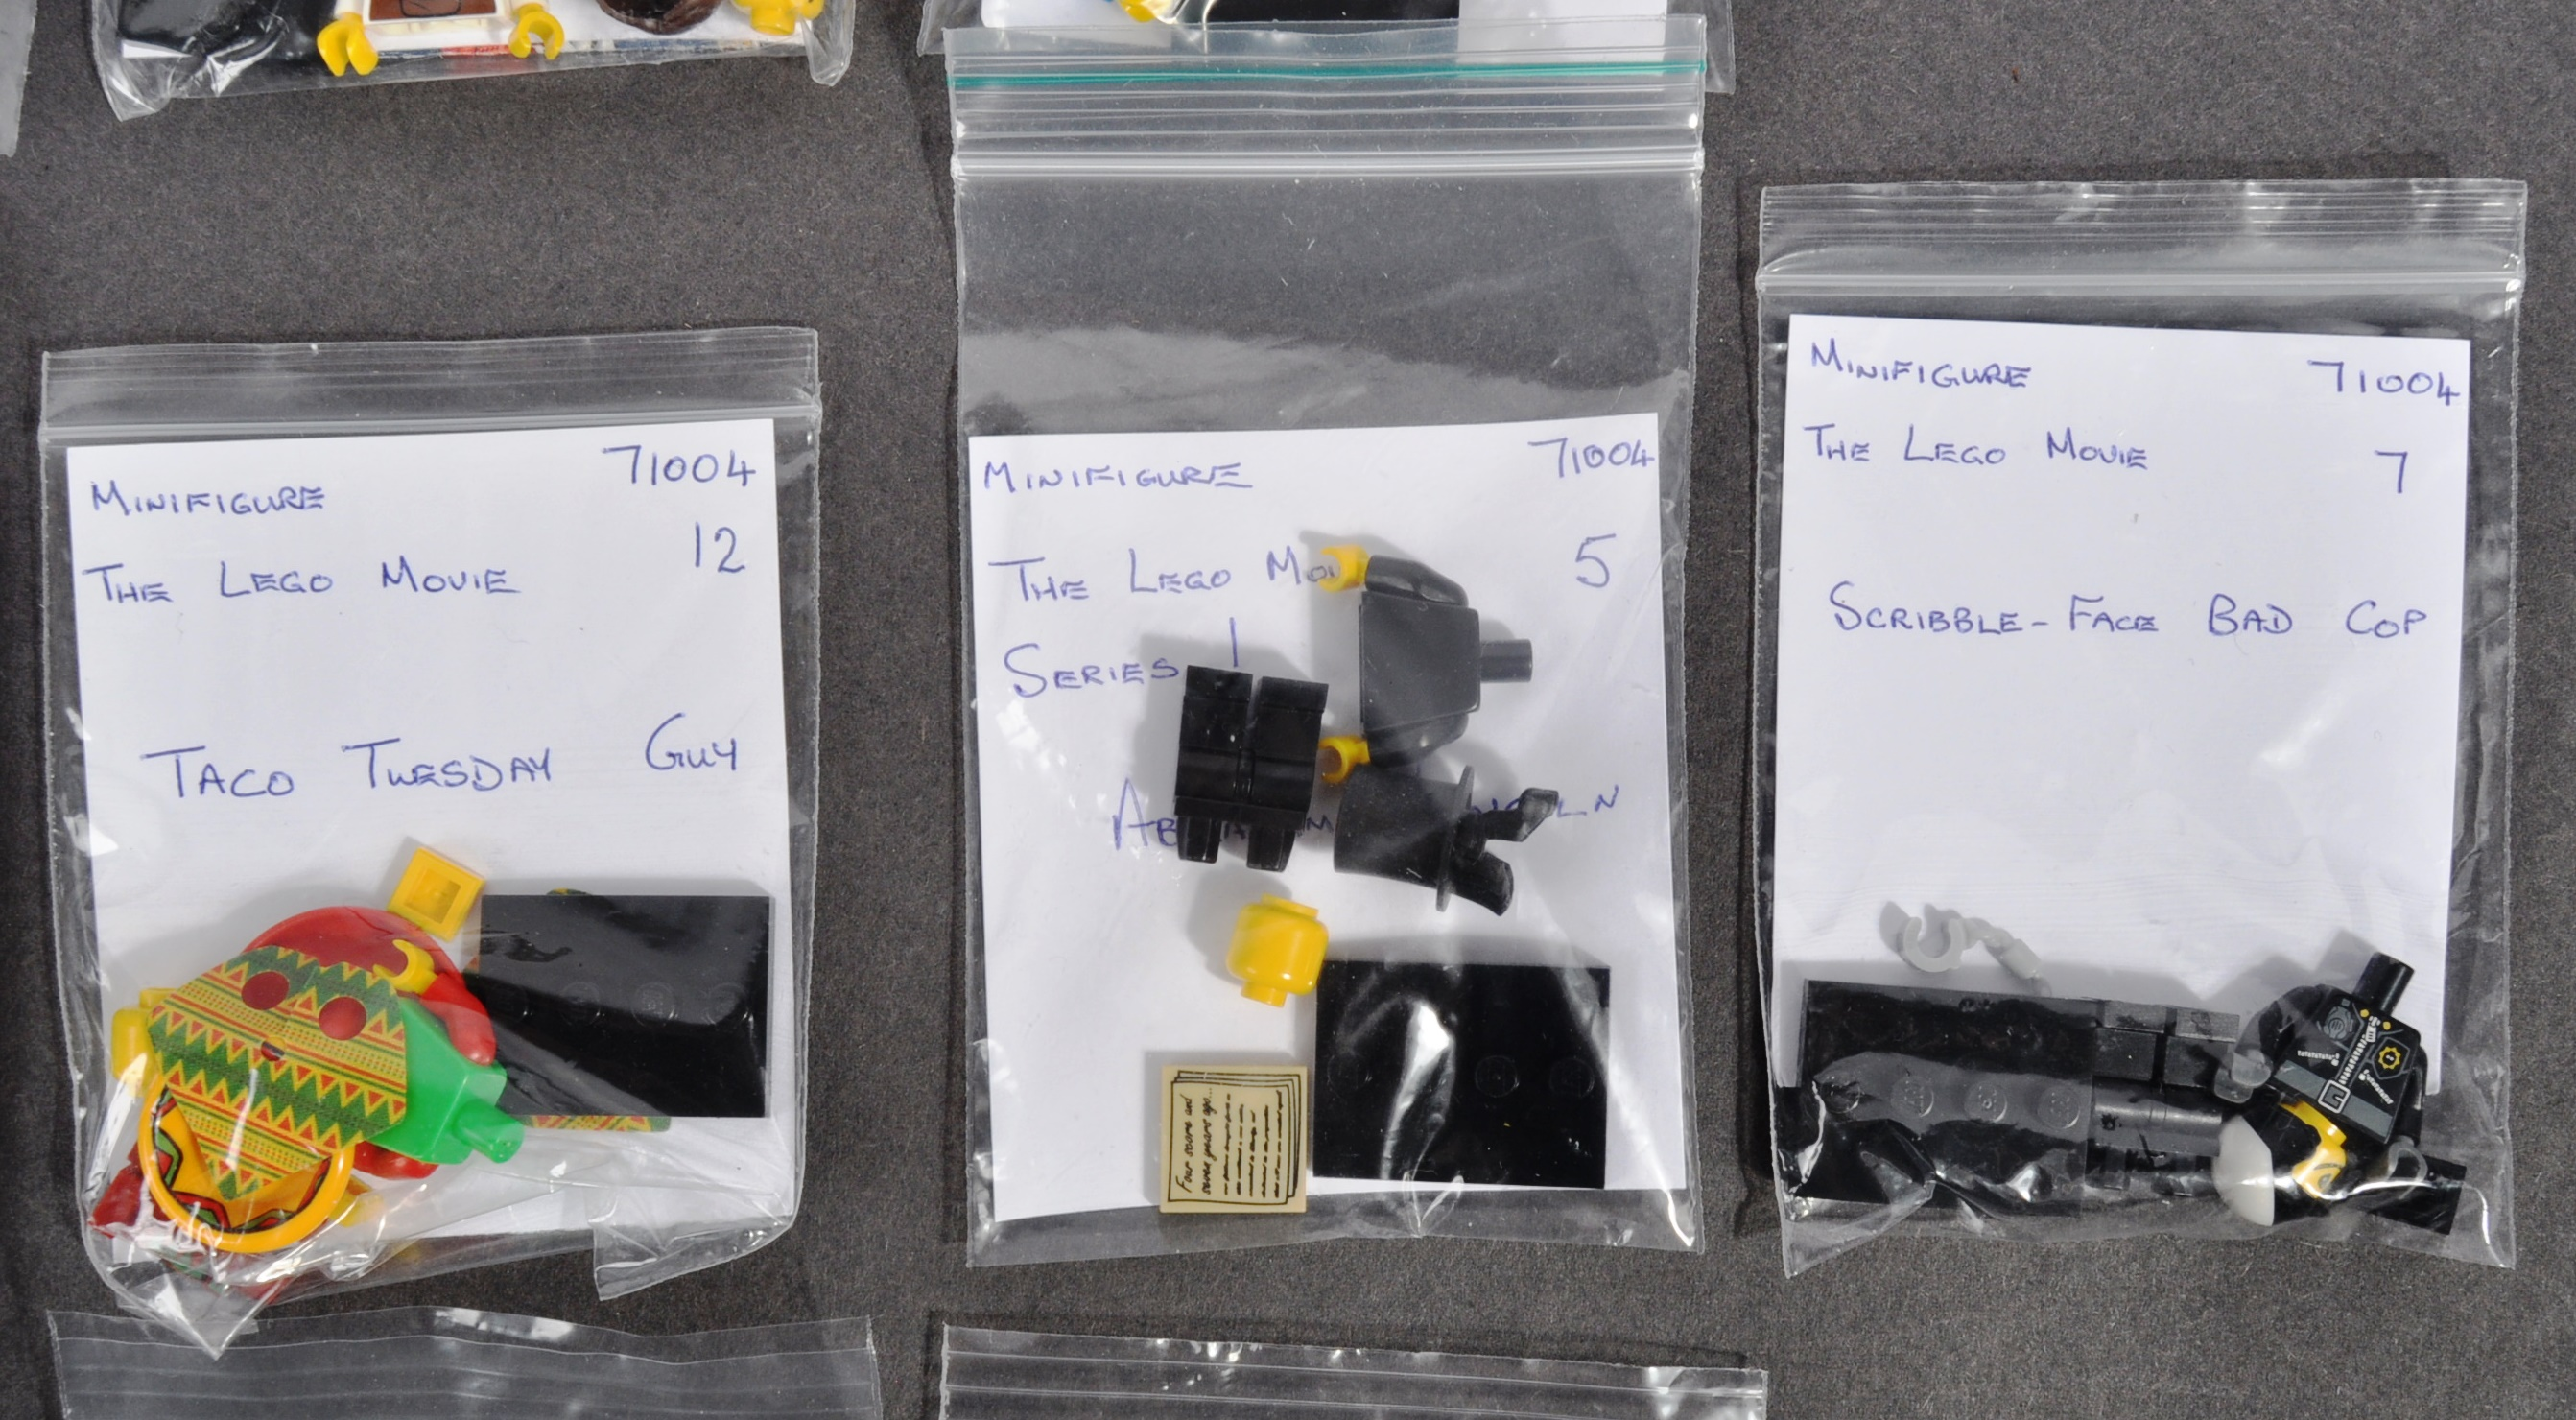 LEGO MINIFIGURES - 71004 - LEGO MOVIE SERIES 1 - Image 4 of 6